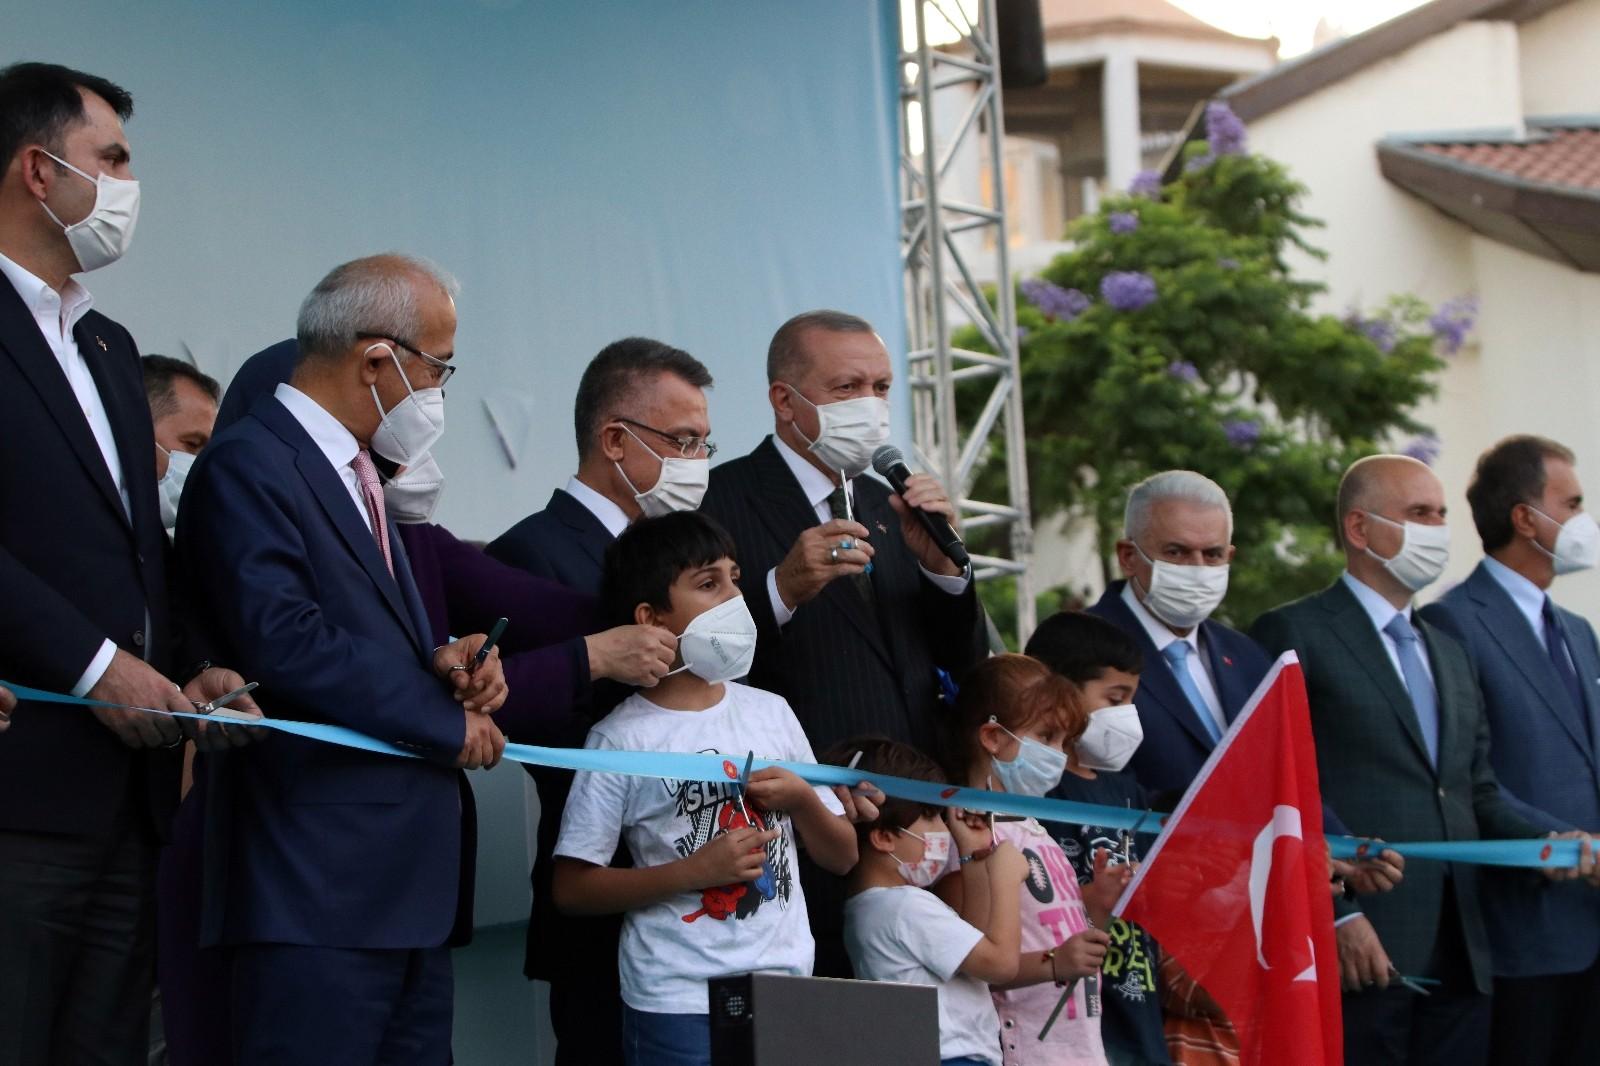 cumhurbaskani erdogan quotamacimiz ulkemizi ikinci ucuncu santrallere kavusturmakquot